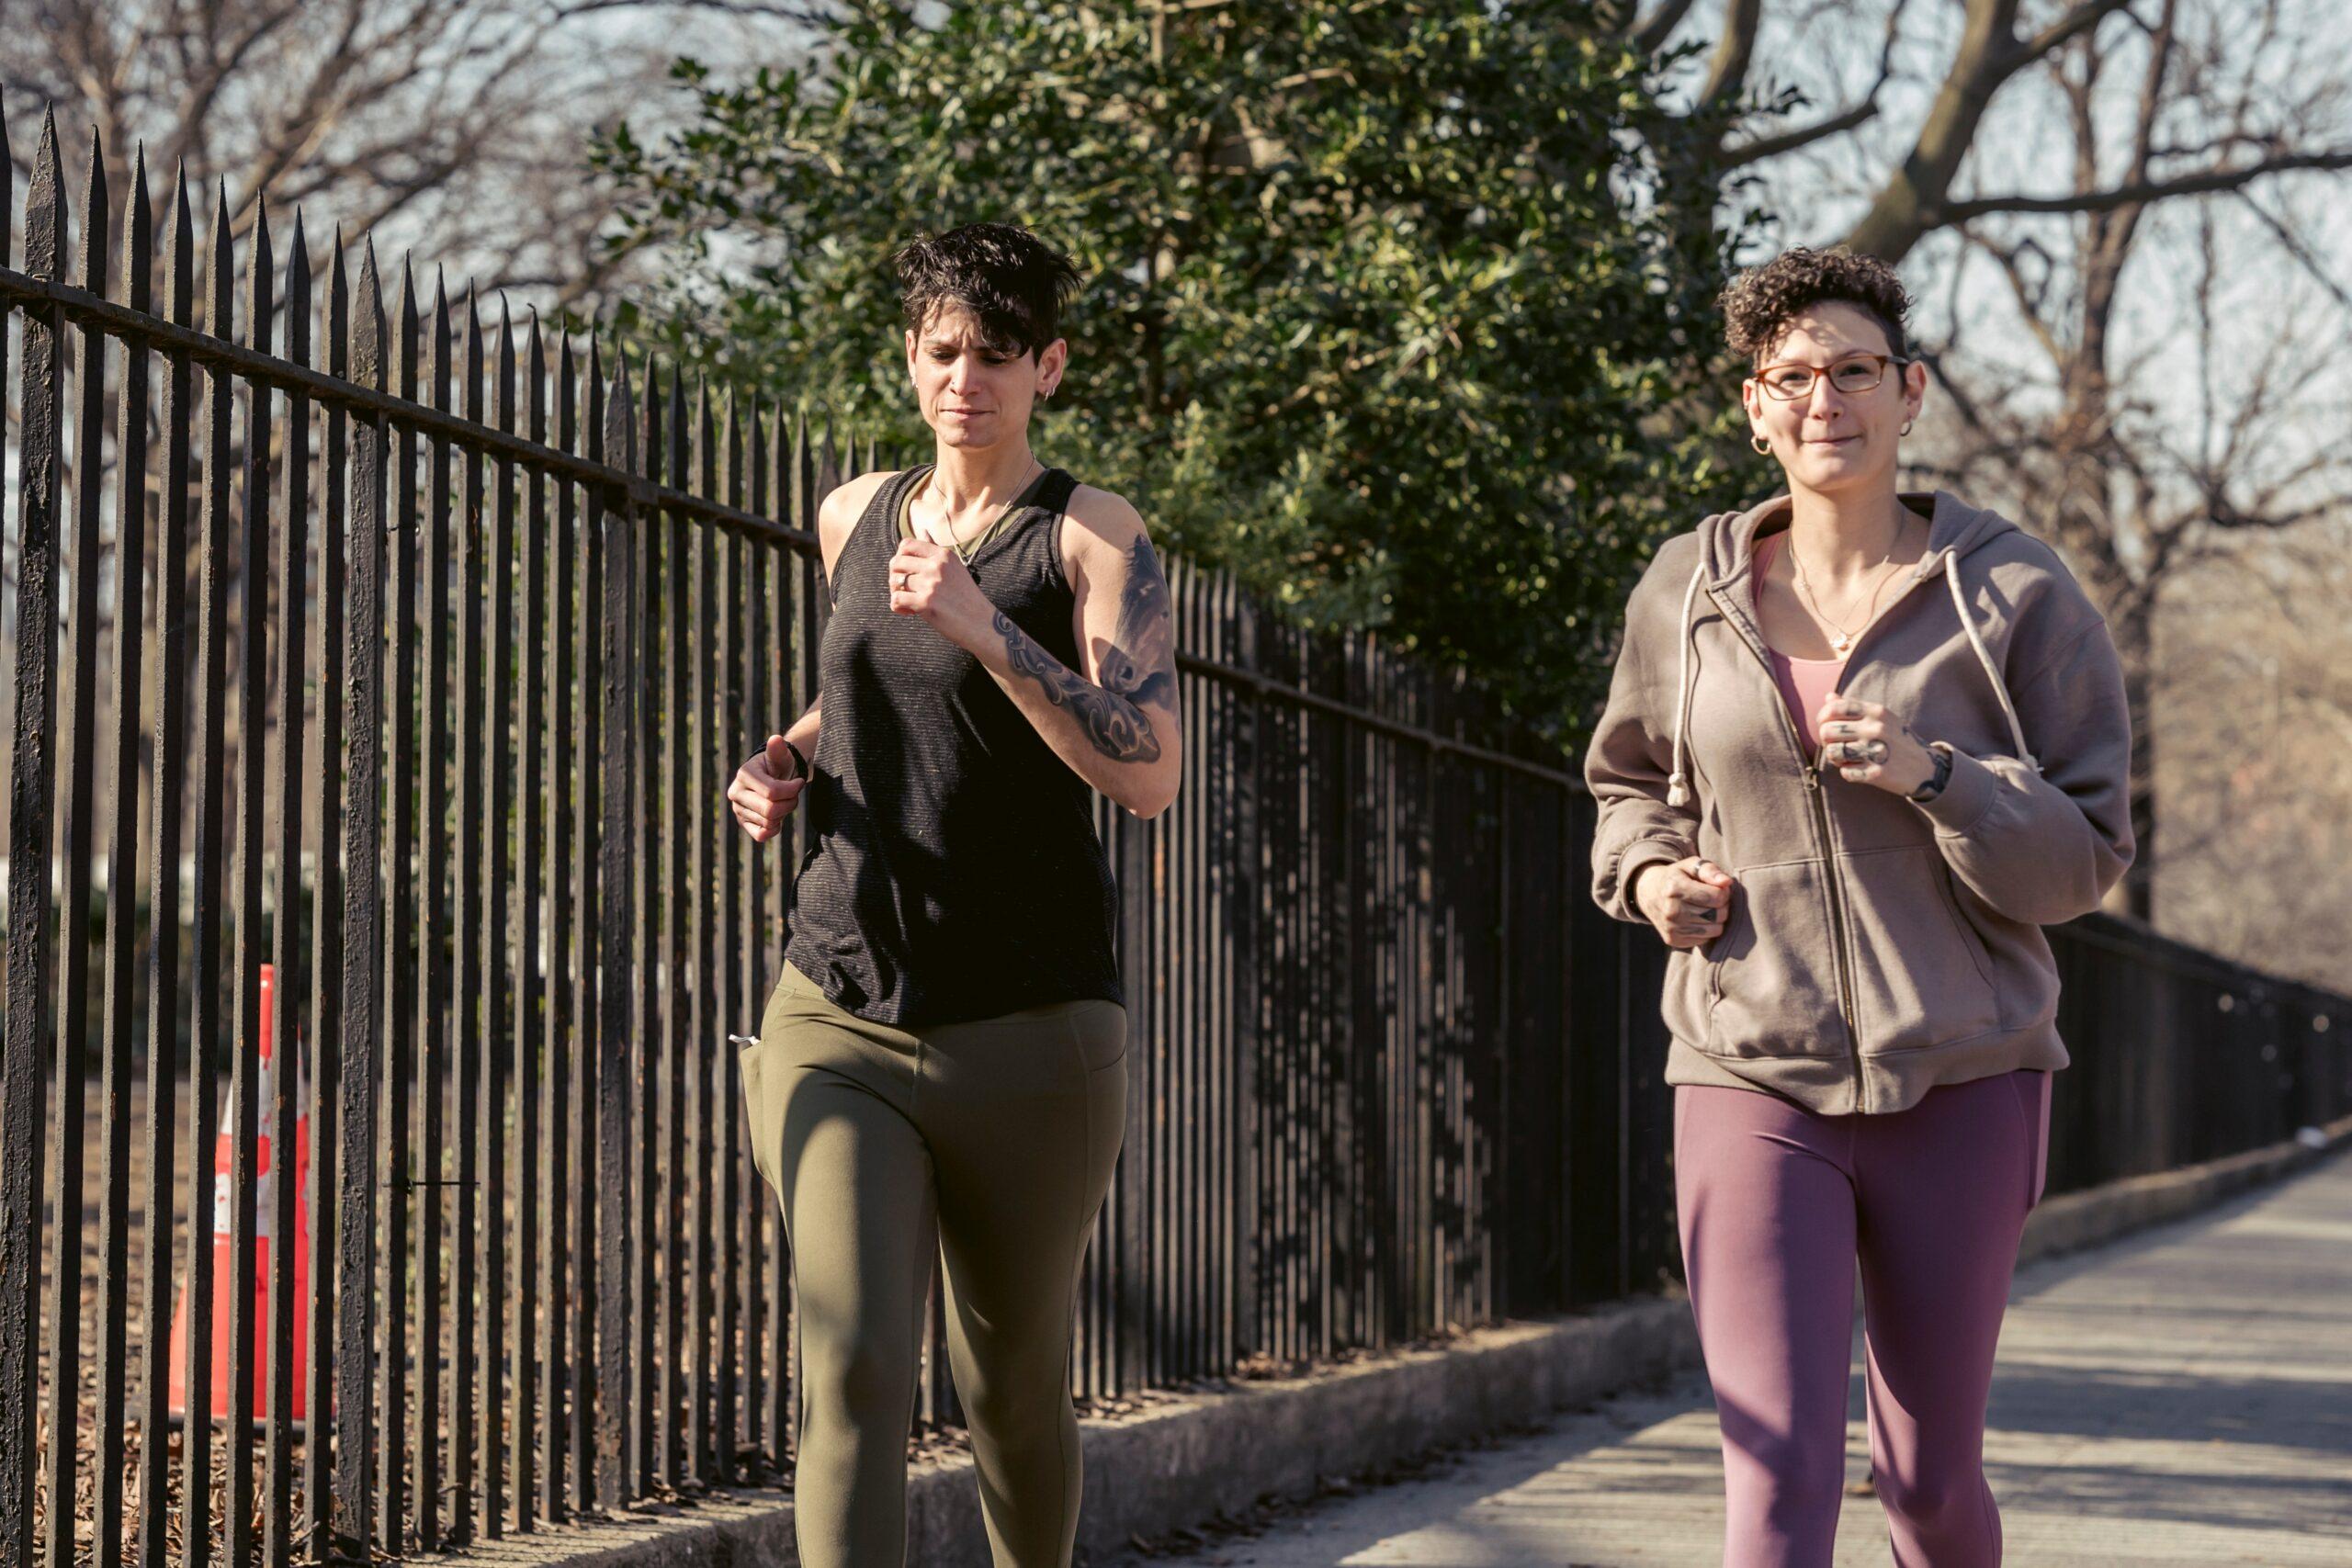 Two women jogging alongside a tall iron fence